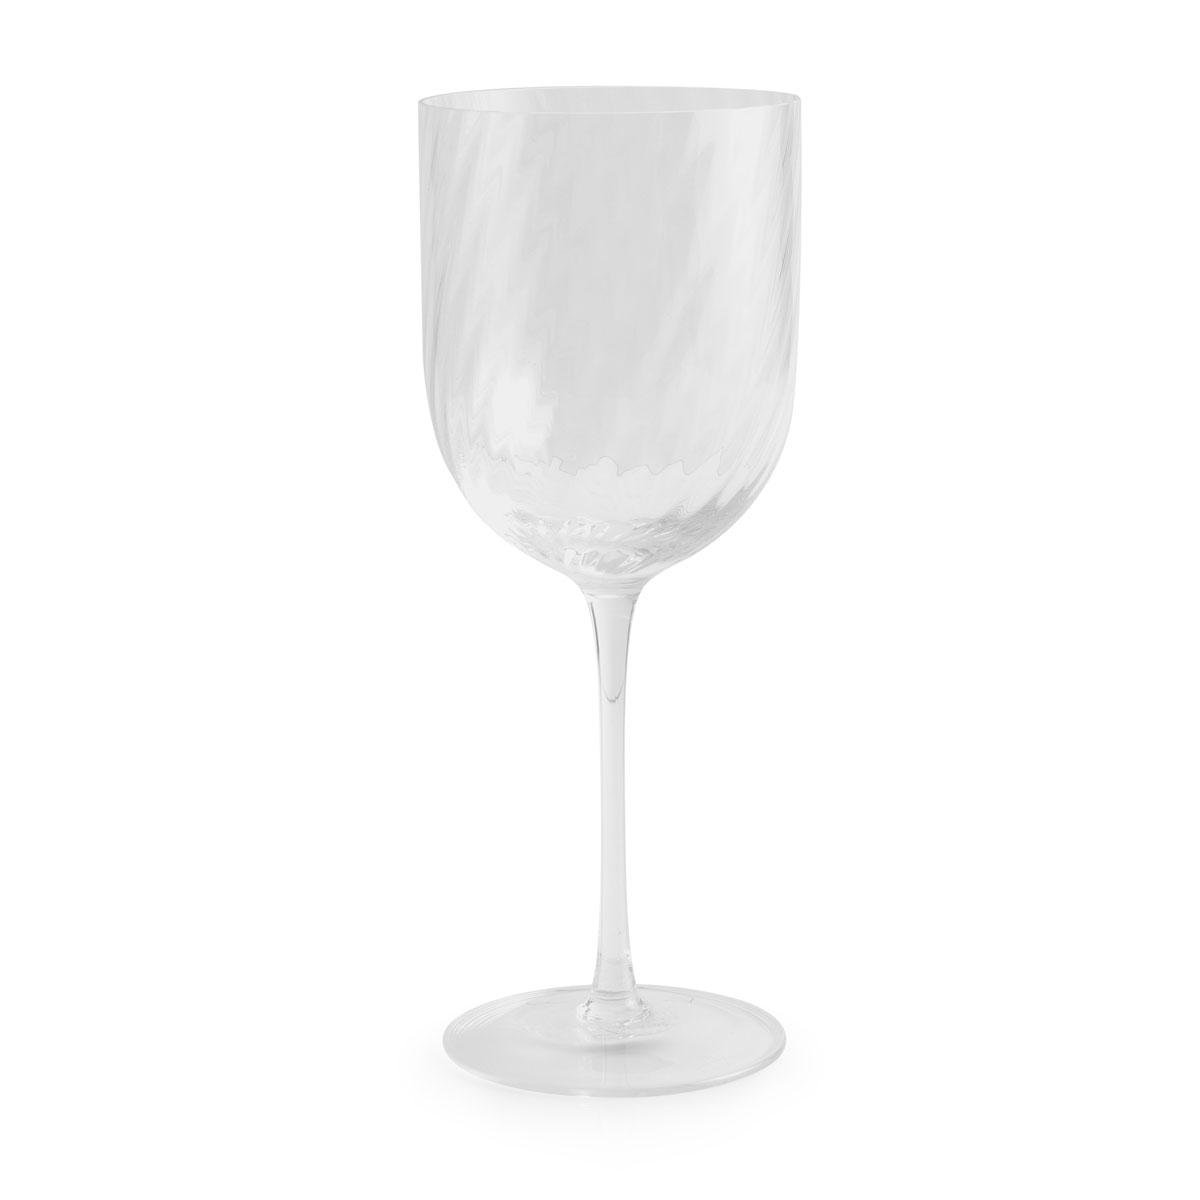 Michael Aram Twist Diamond Water Glass, Single